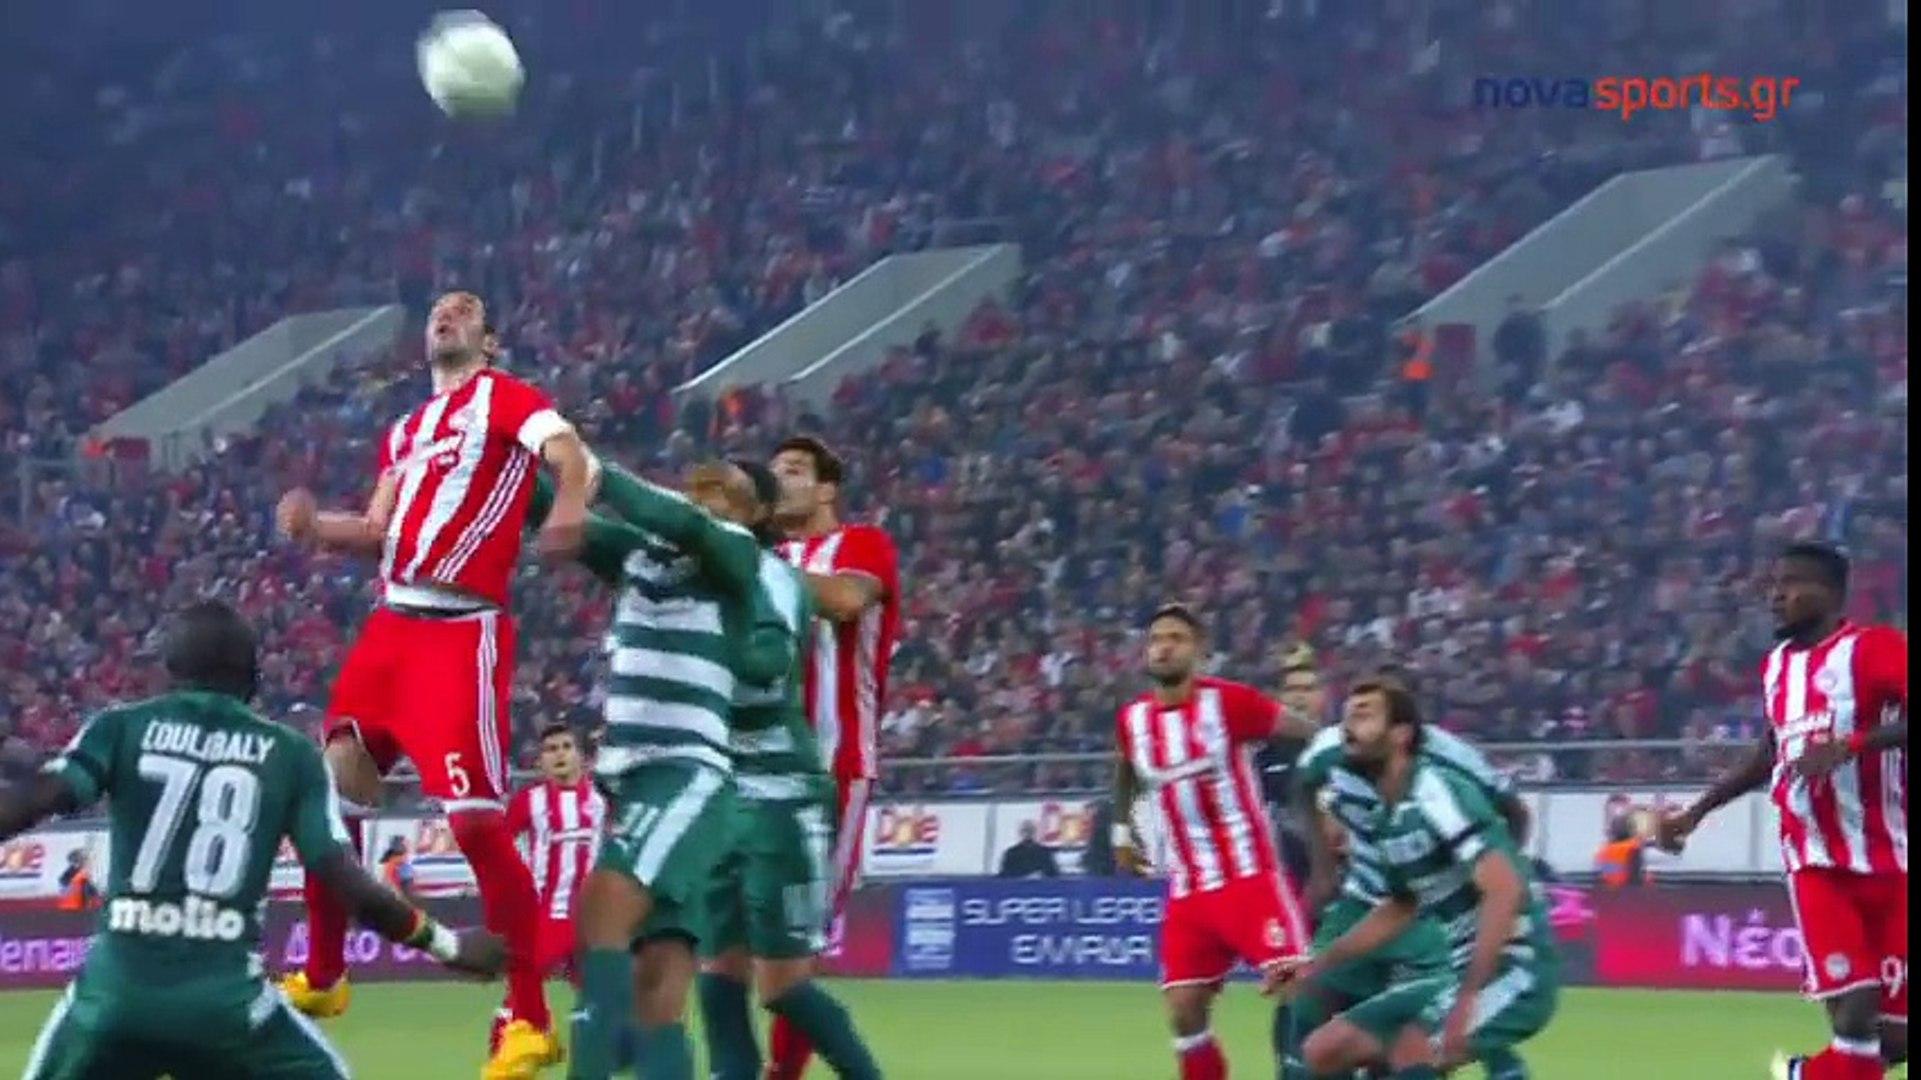 Superliga de Grecia 2016/17: Olympiacos 3 - 0 Panathinaikos (06.11.2016)